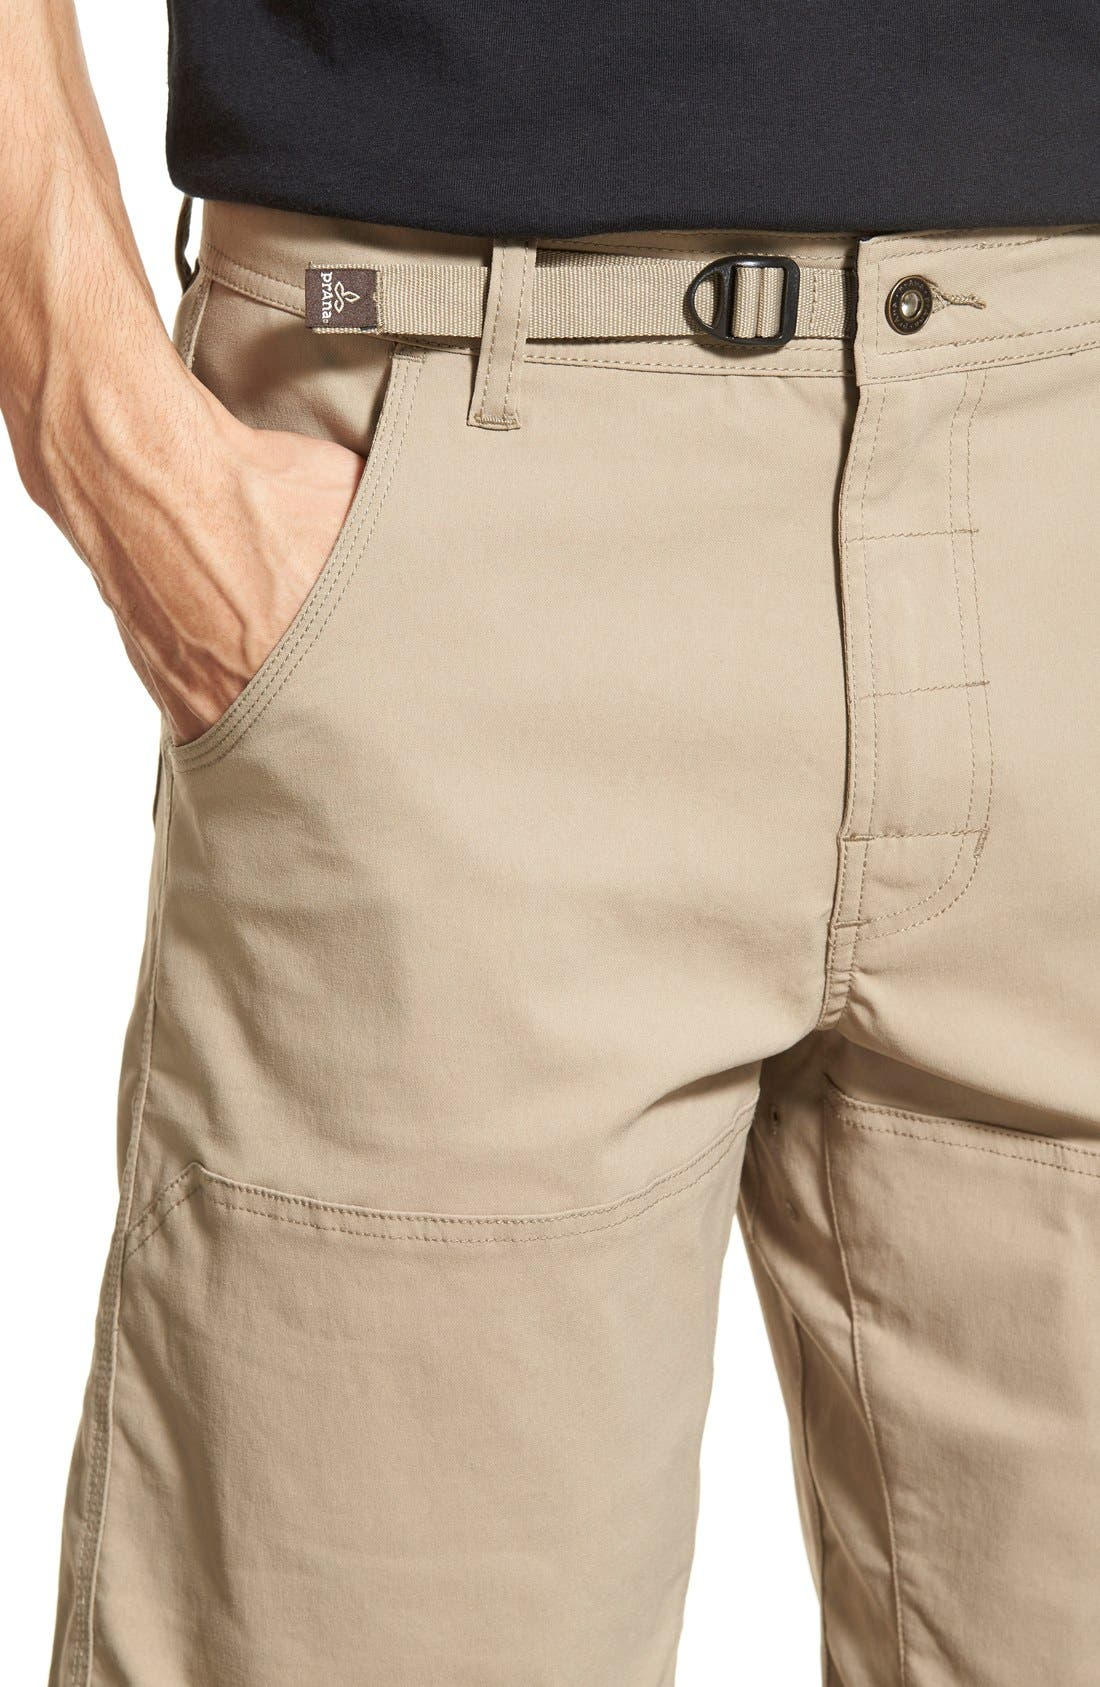 Zion Stretch Shorts,                             Alternate thumbnail 4, color,                             Dark Khaki